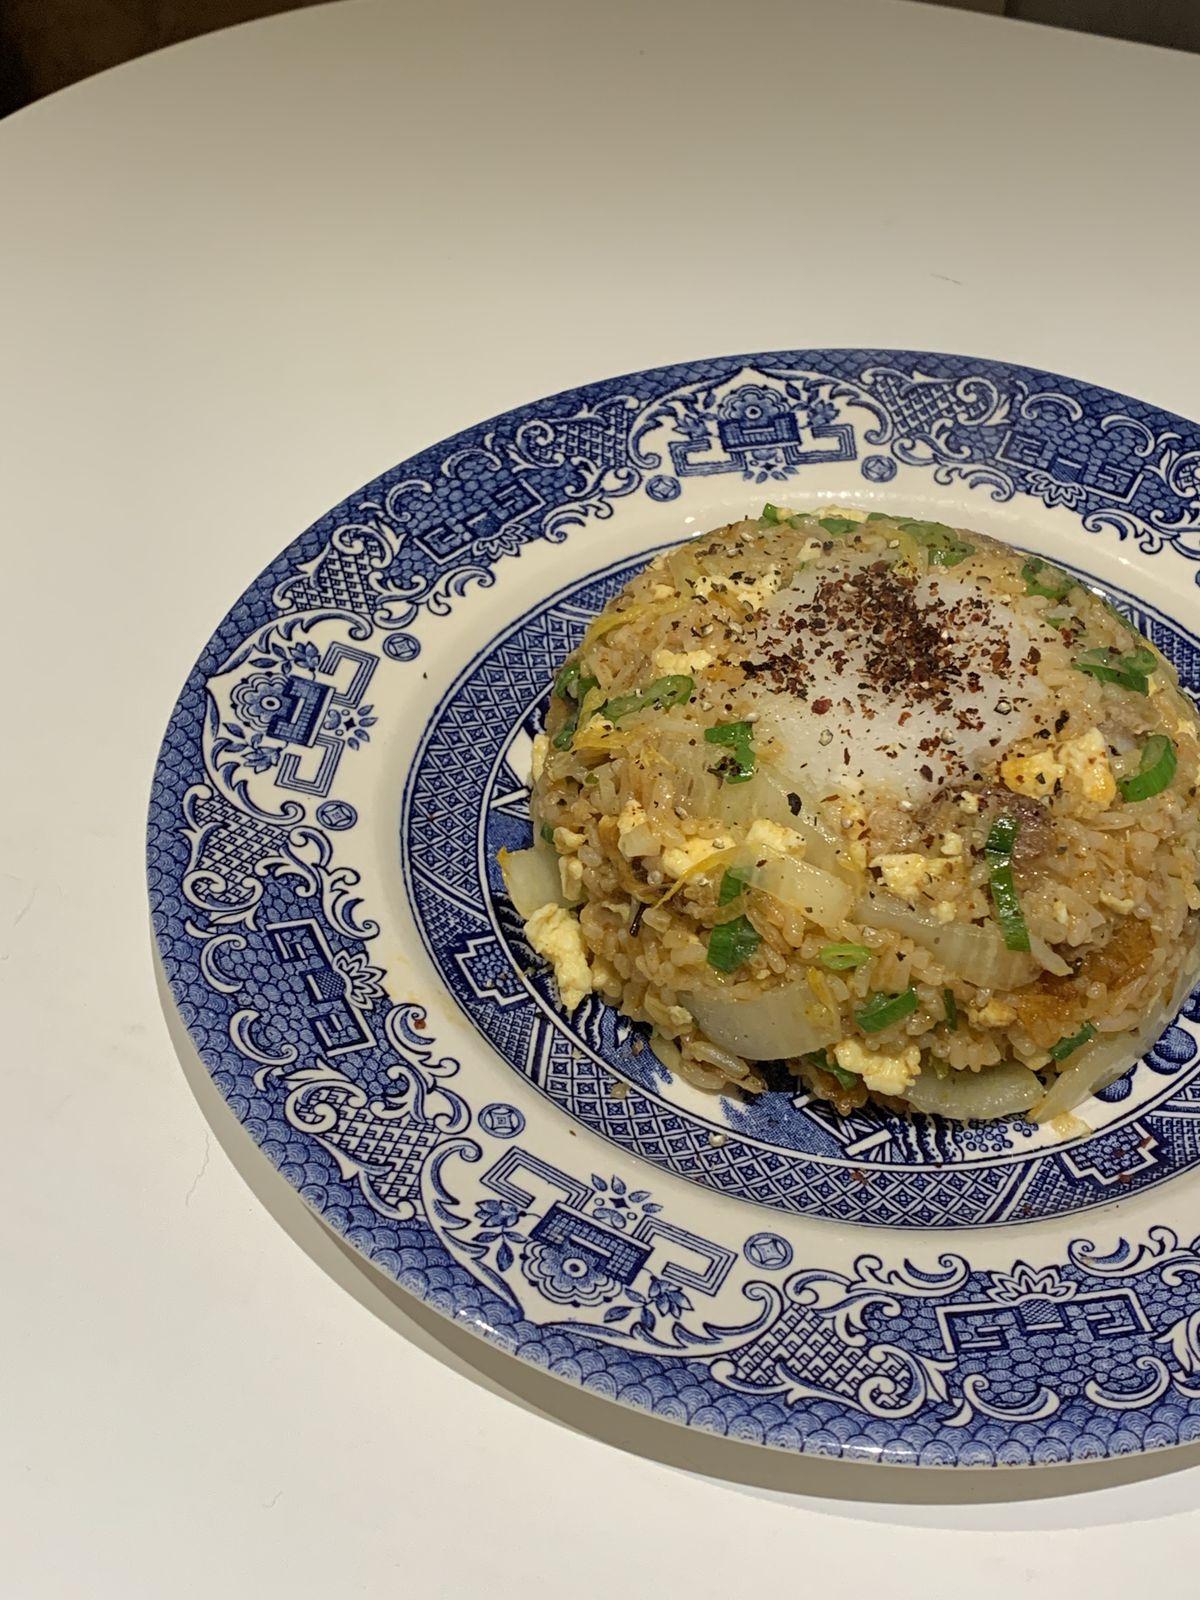 Anaïs van Manen's fried rice